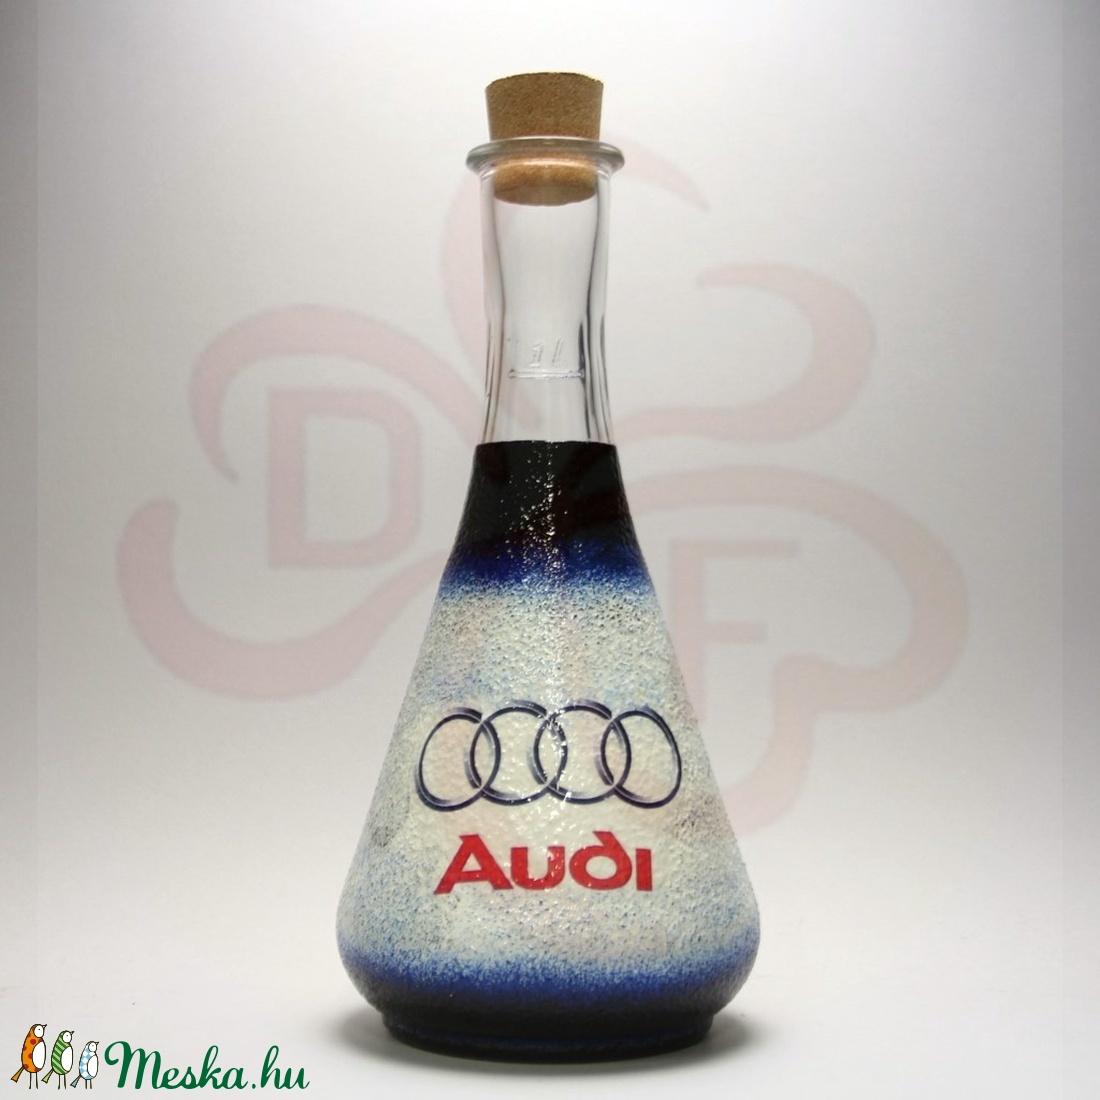 Audi bor kiöntő ; Audi rajongóknak - Meska.hu